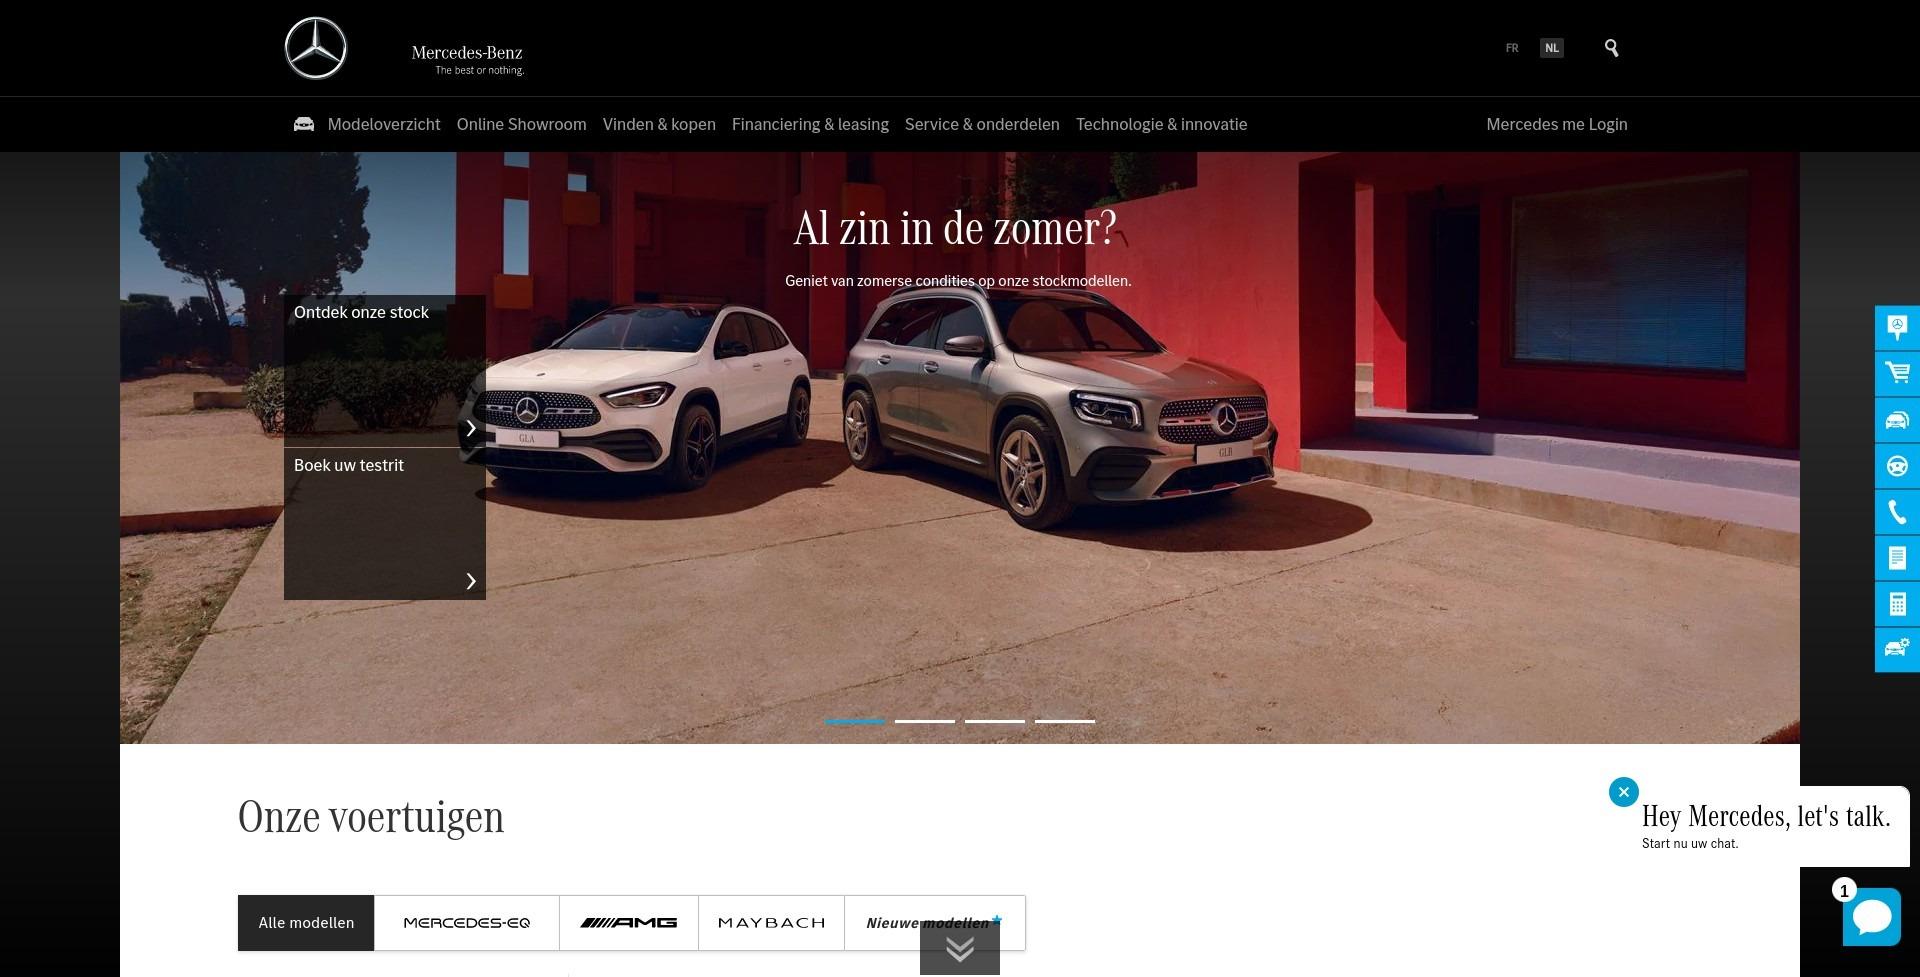 Live chat on Mercedes-Benz Belgium